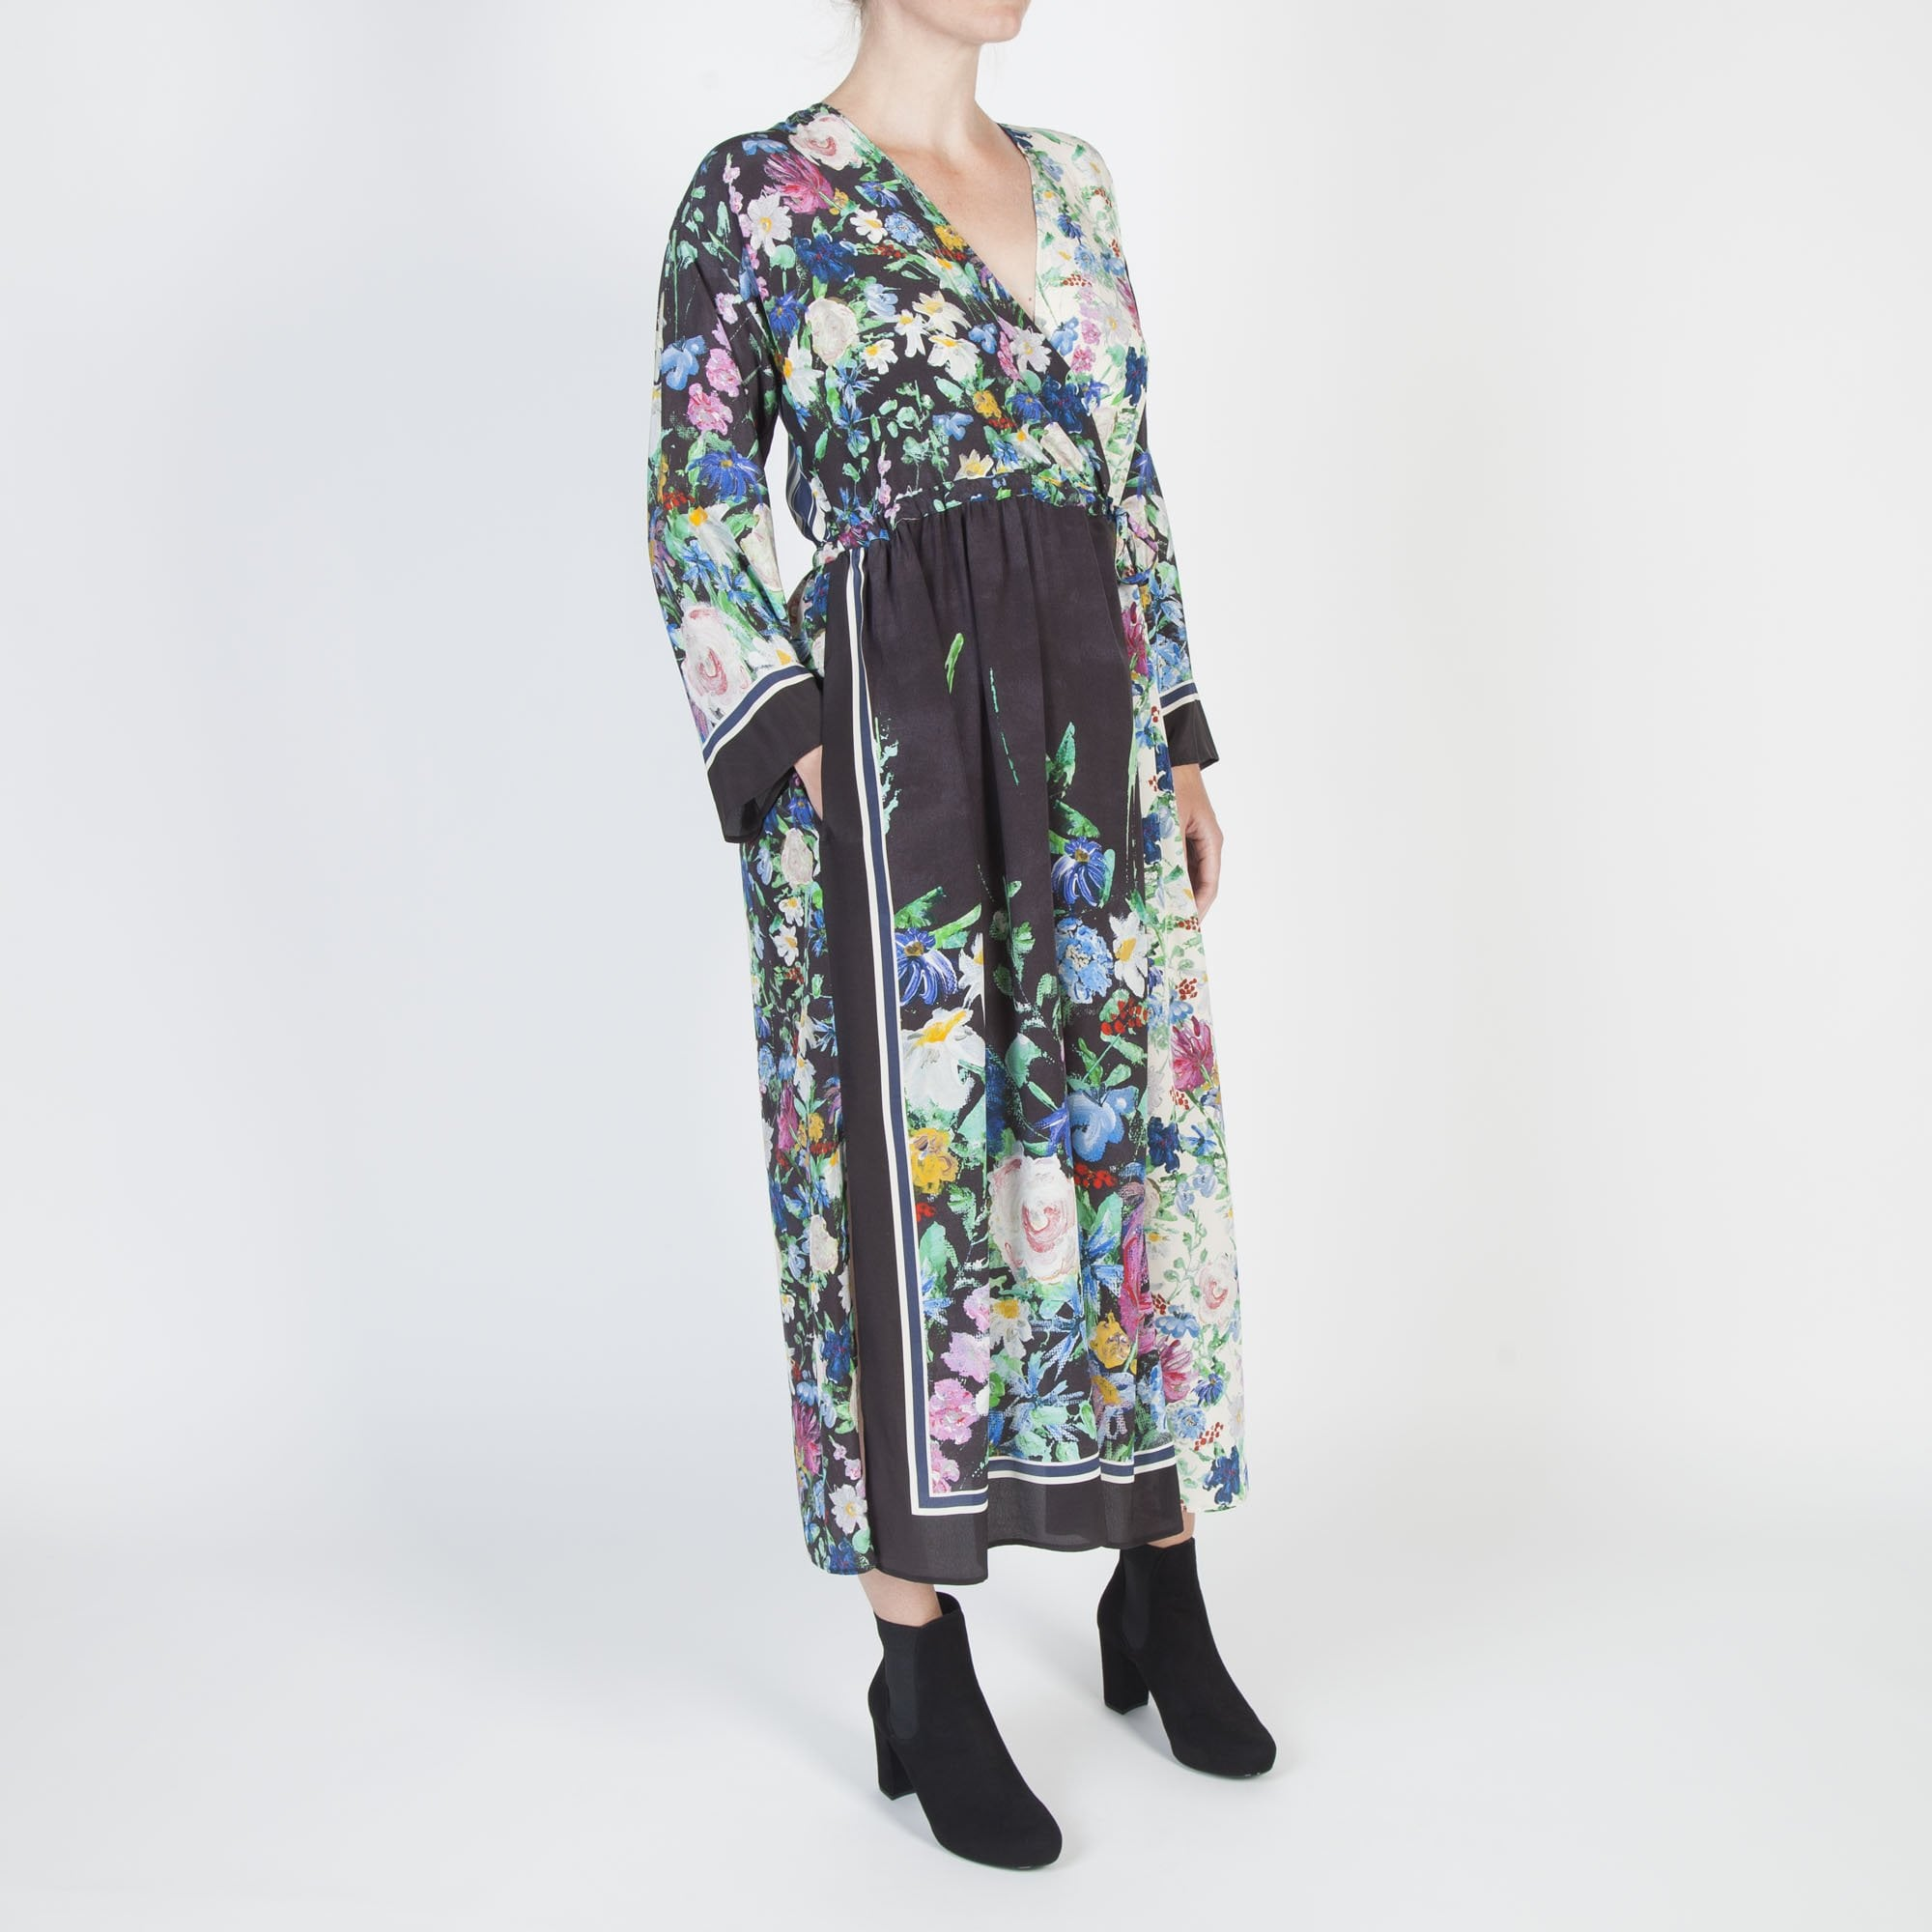 ac5d09b0d94 S Max Mara Smalto Silk Floral Dress in Black Multi